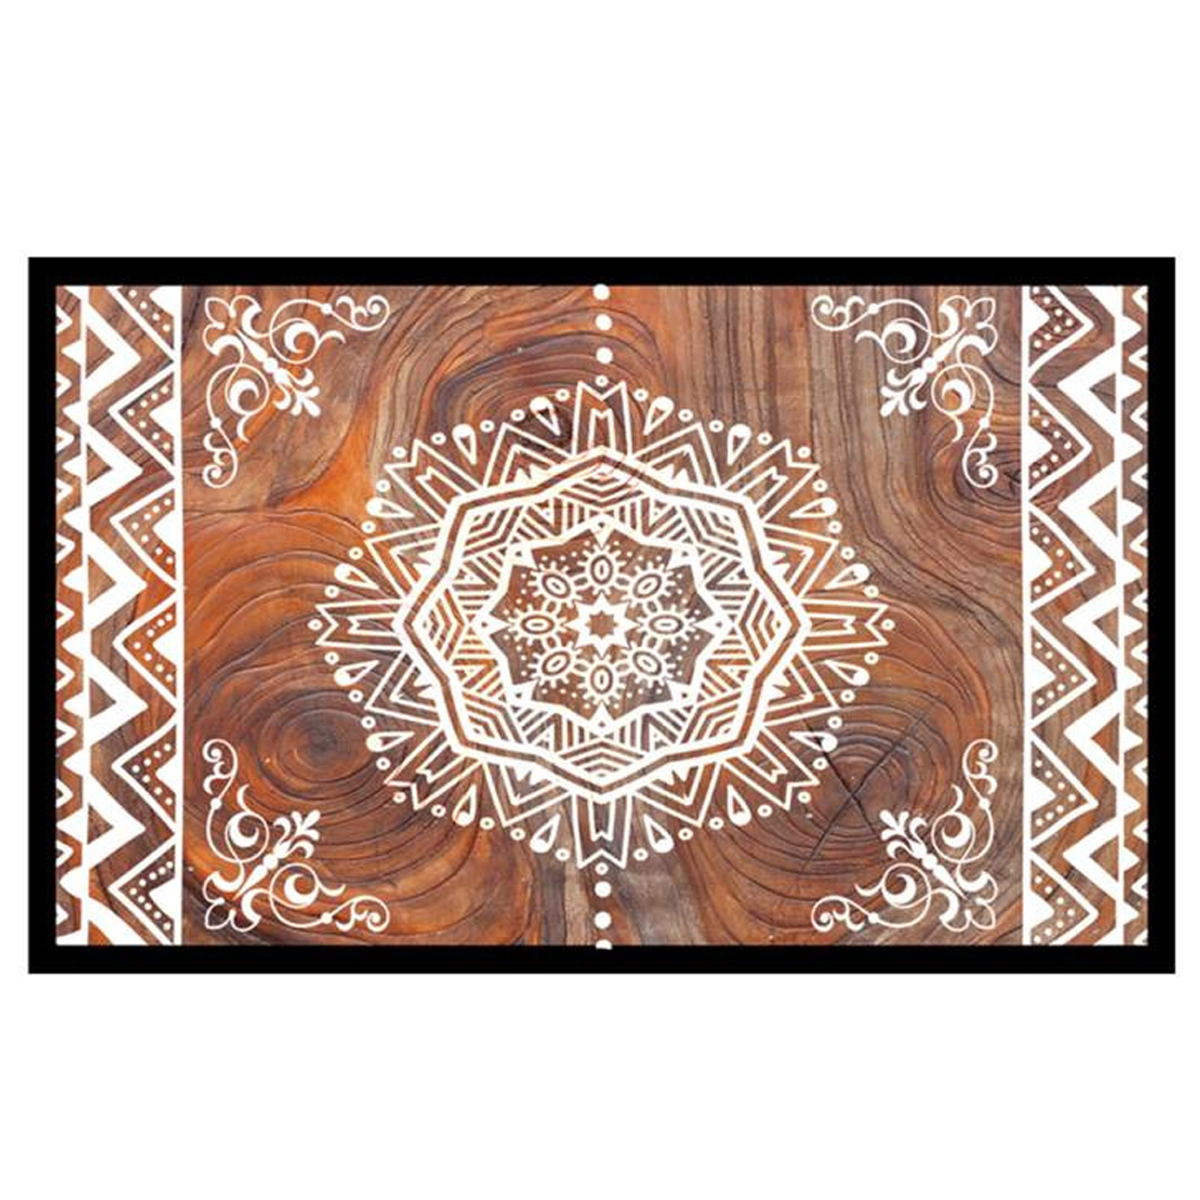 Tapis Intérieur \'Boho\' (mandala) marron blanc - 60x40 cm - [Q9680]